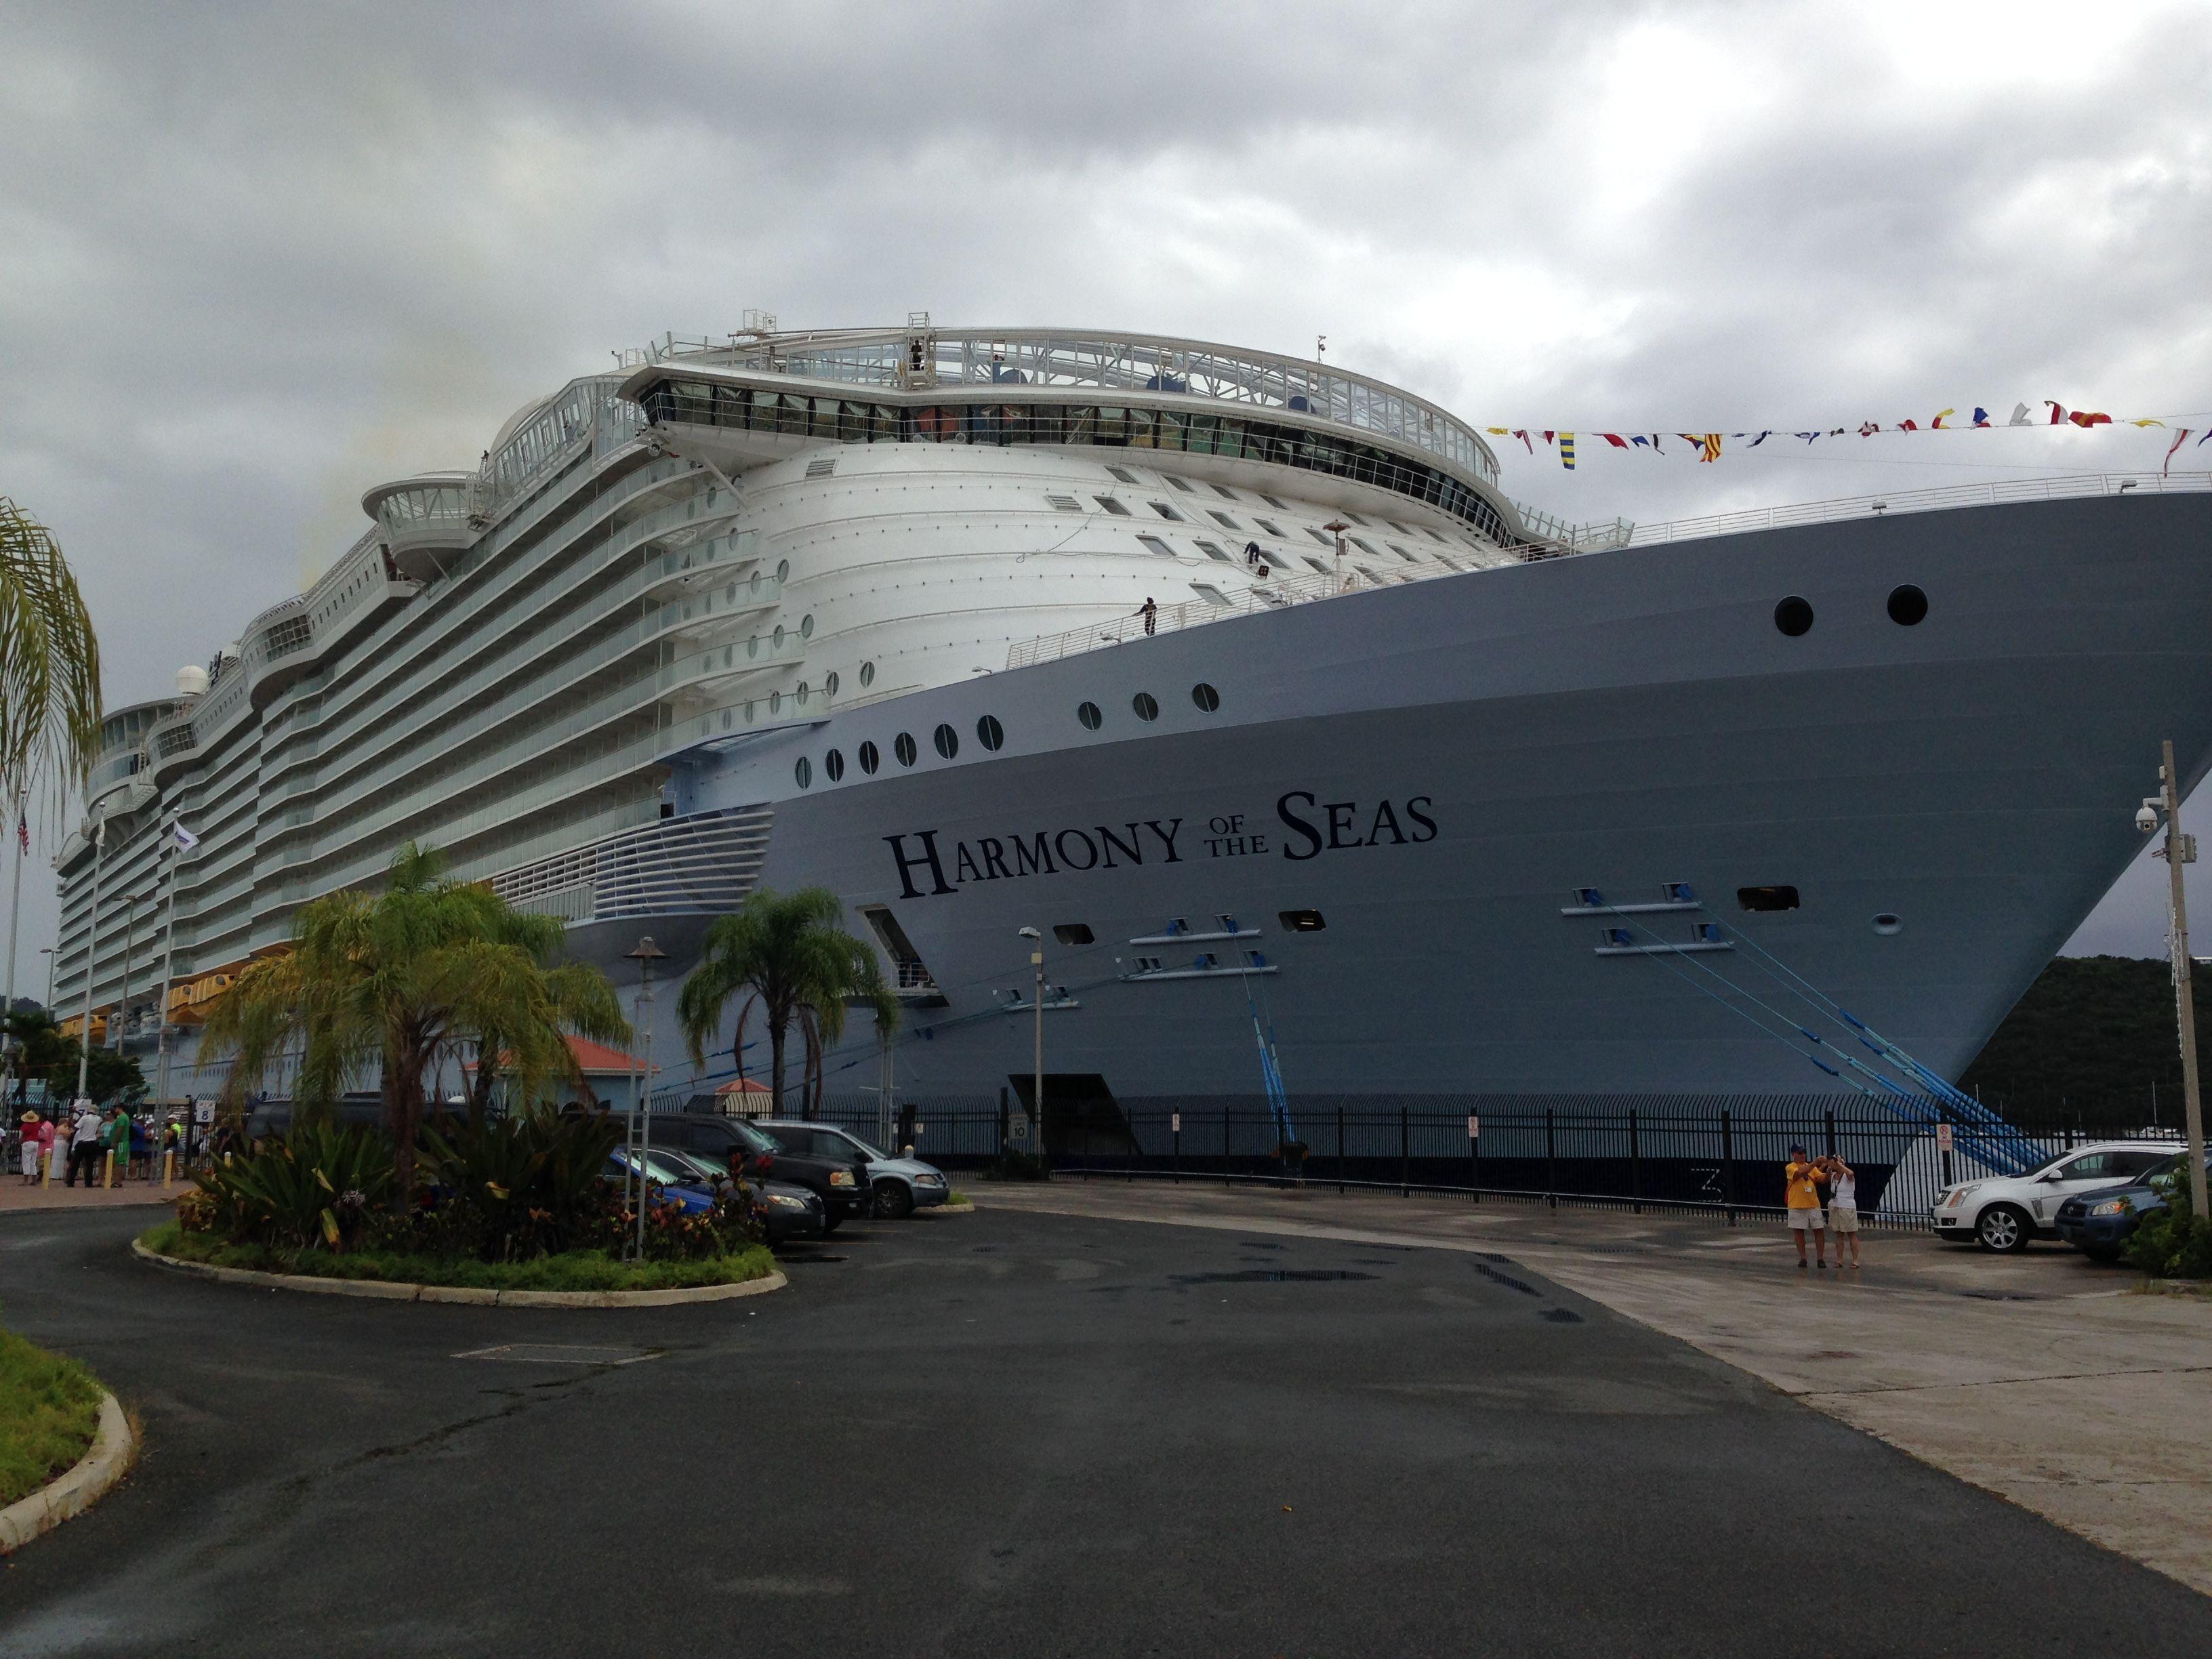 Pin By Pebal On Cruise Ships Pinterest Cruises Cruise Ships - Track royal caribbean cruise ships